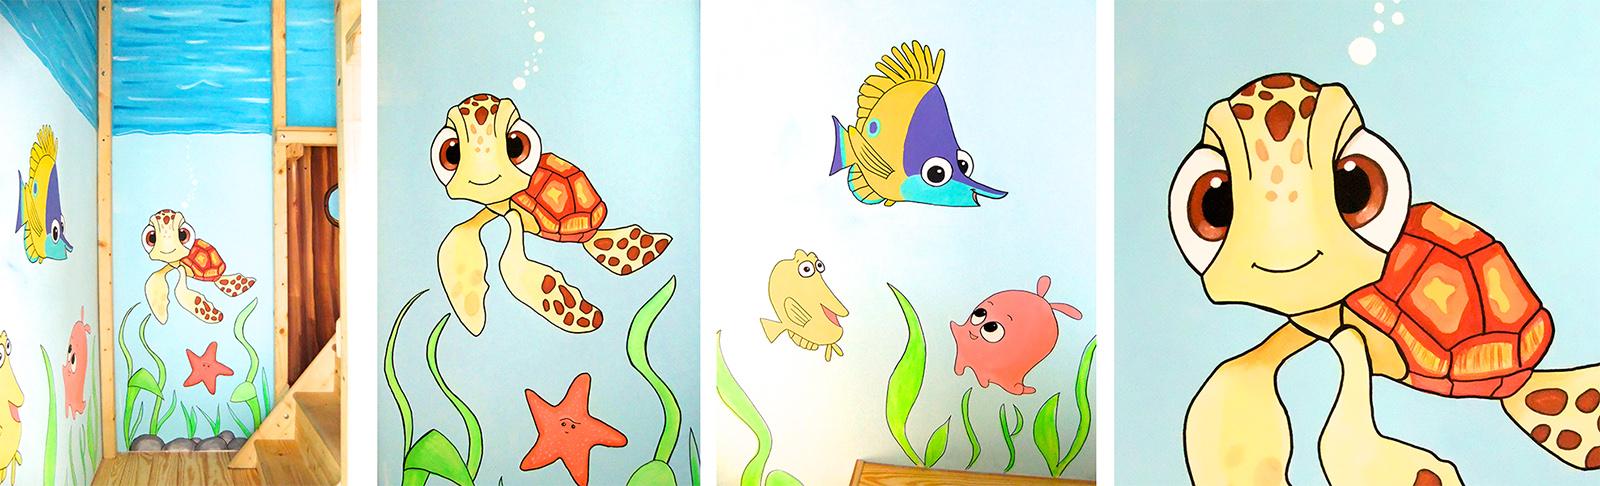 Wandgestaltung Wandbemalung Und Wandgemalde Fur Kinderzimmer Sweetwall